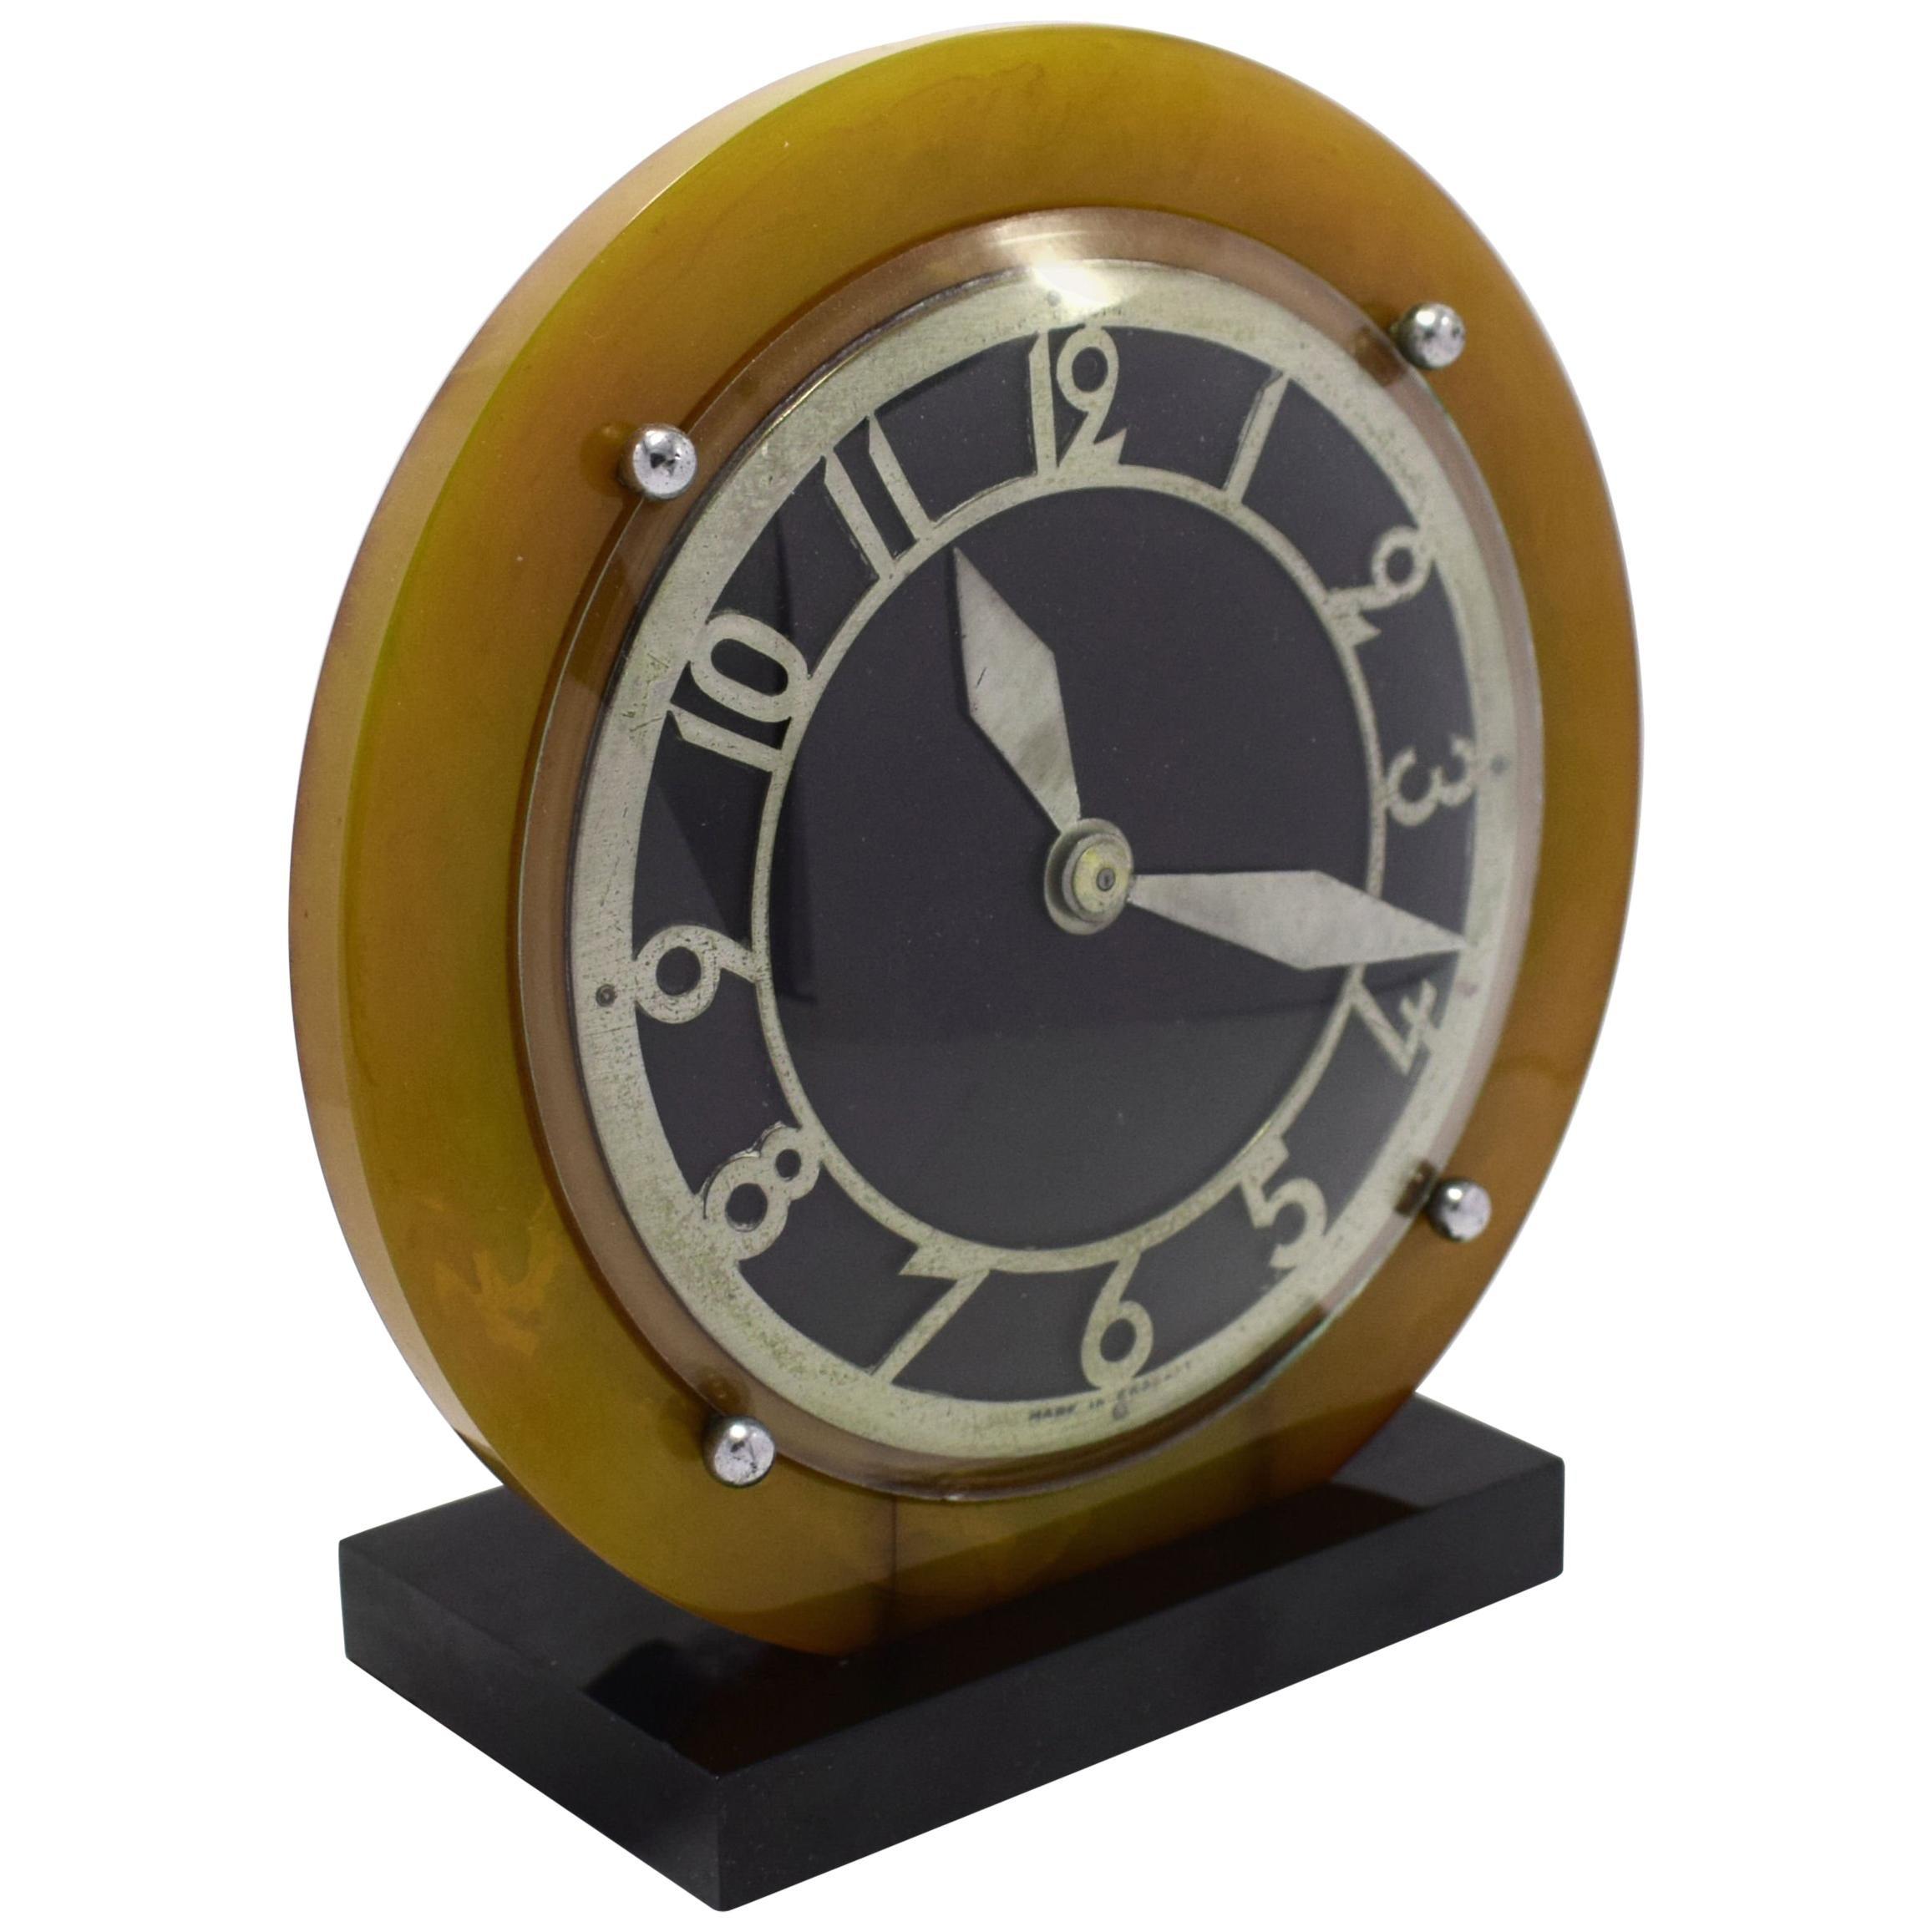 1930s Catalin Bakelite Art Deco English Electric Clock